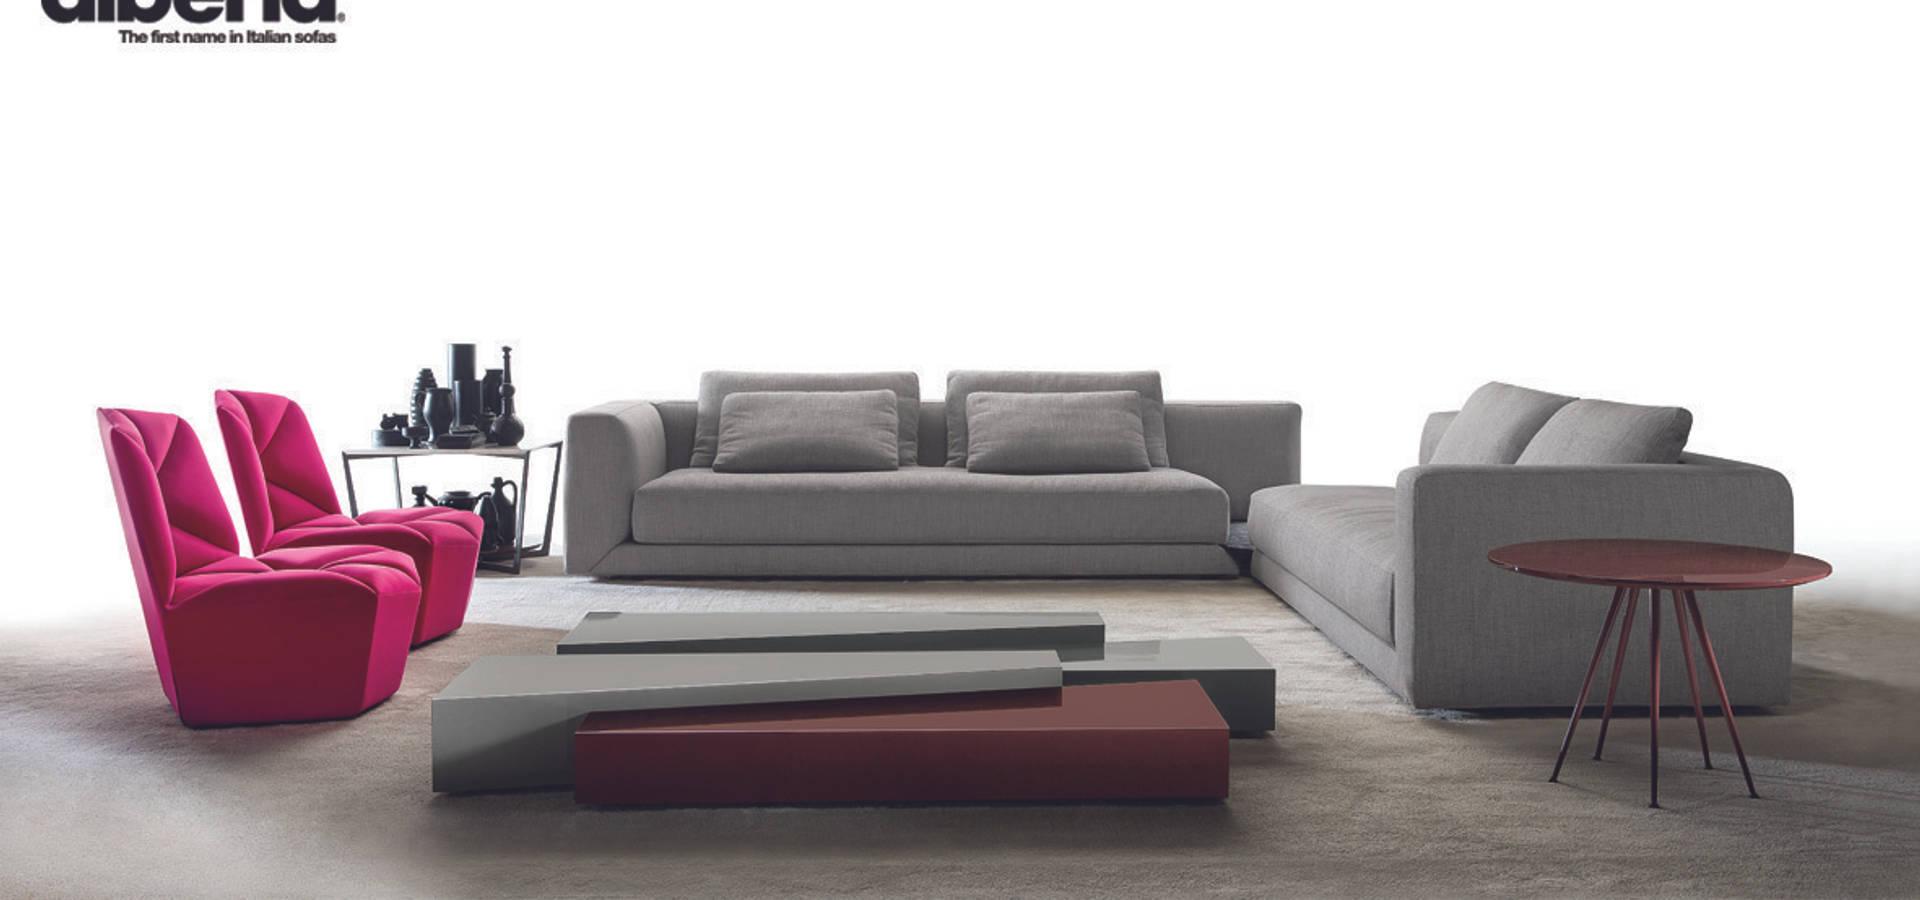 Alberta Pacific Furniture